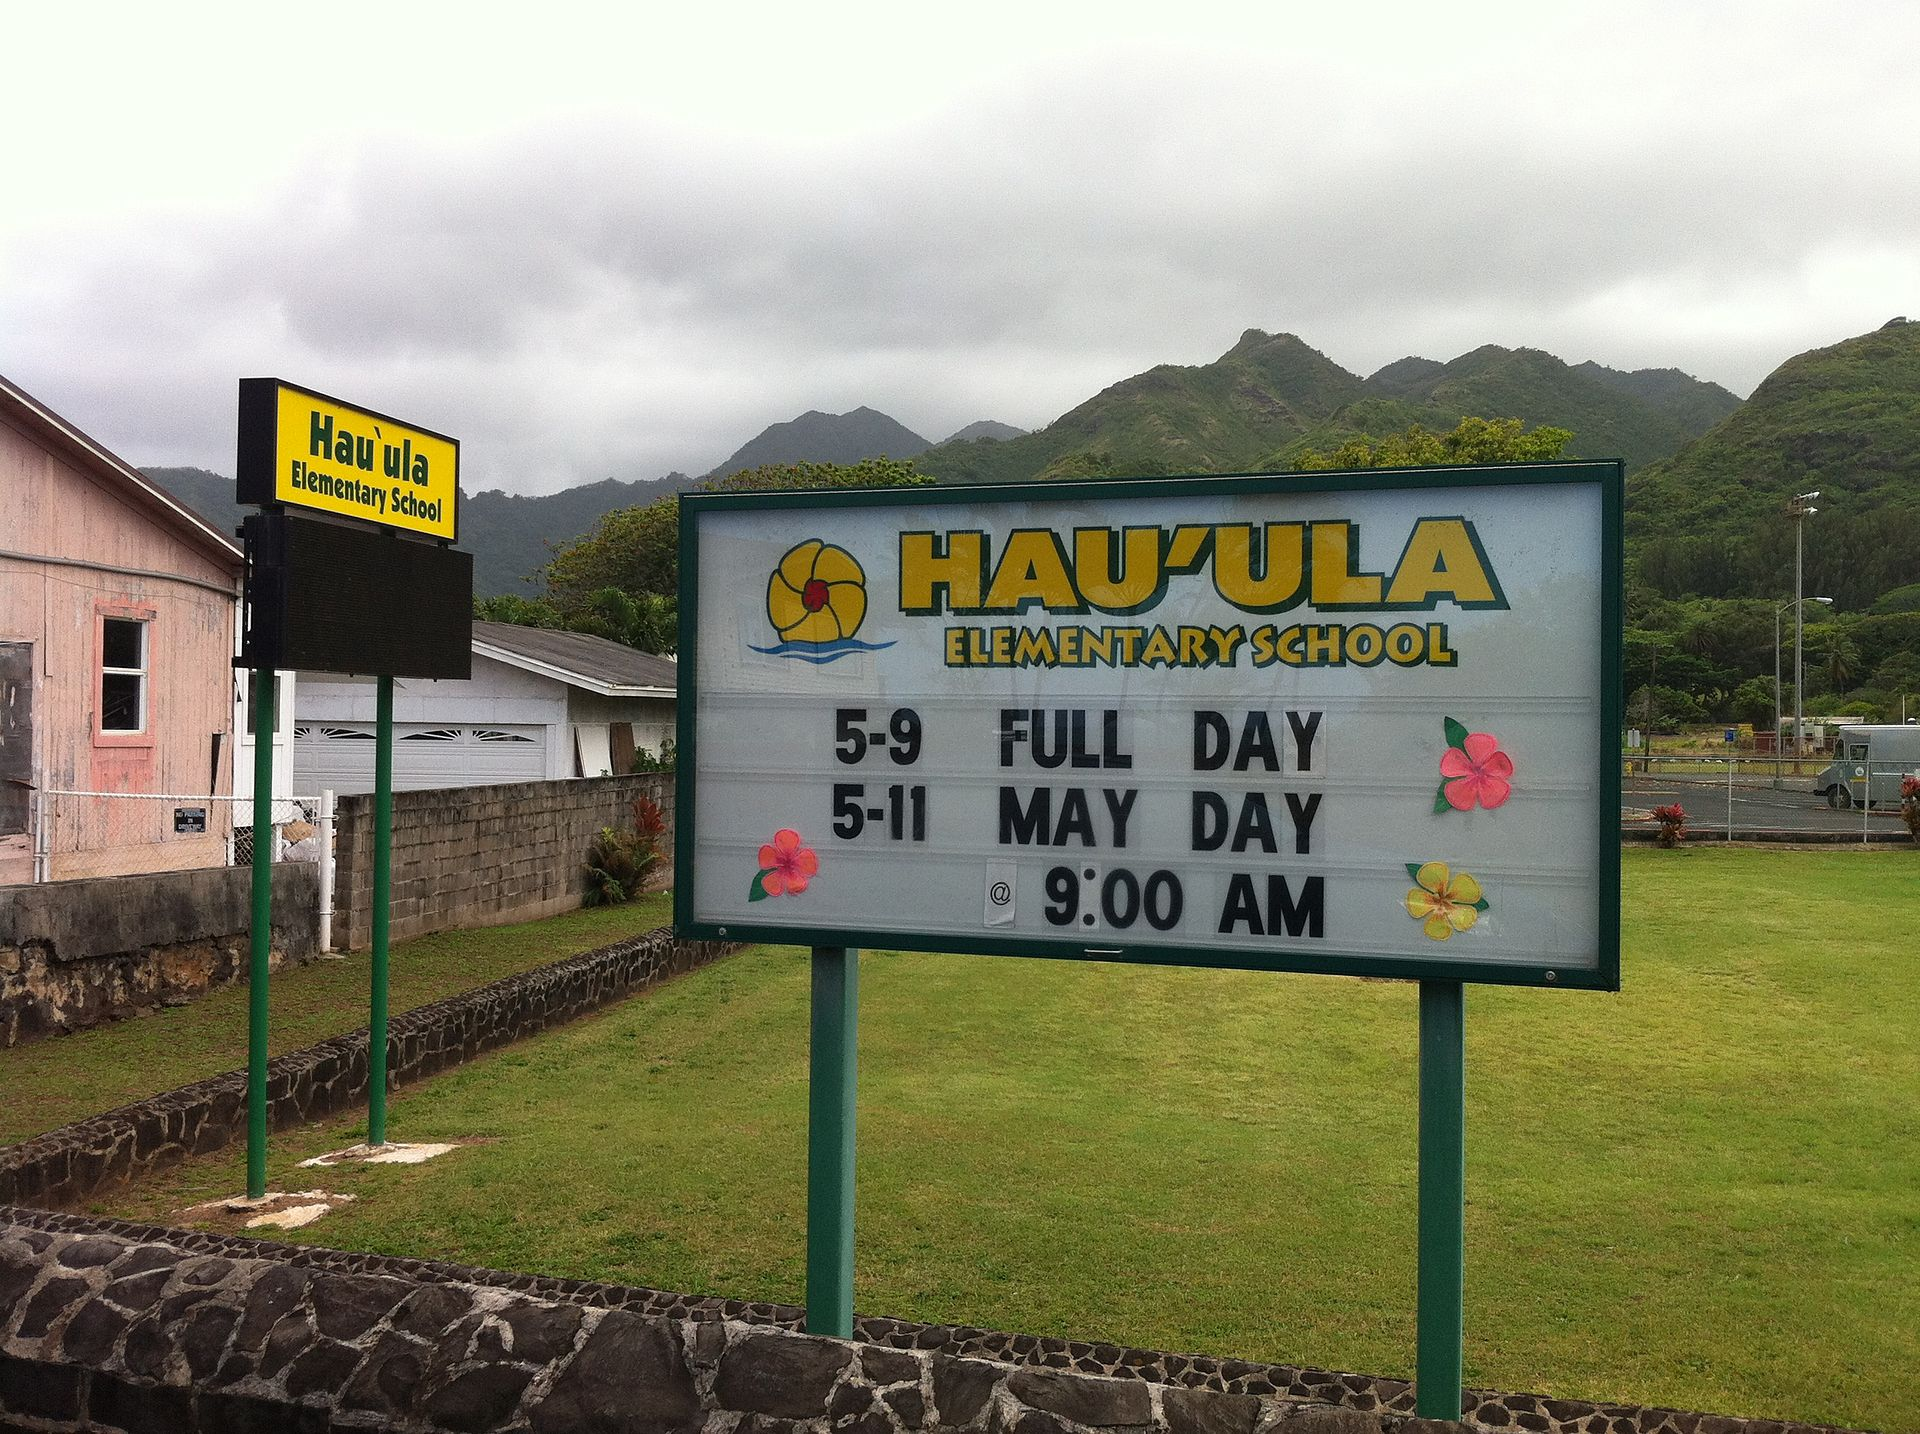 Elementary School Hauula